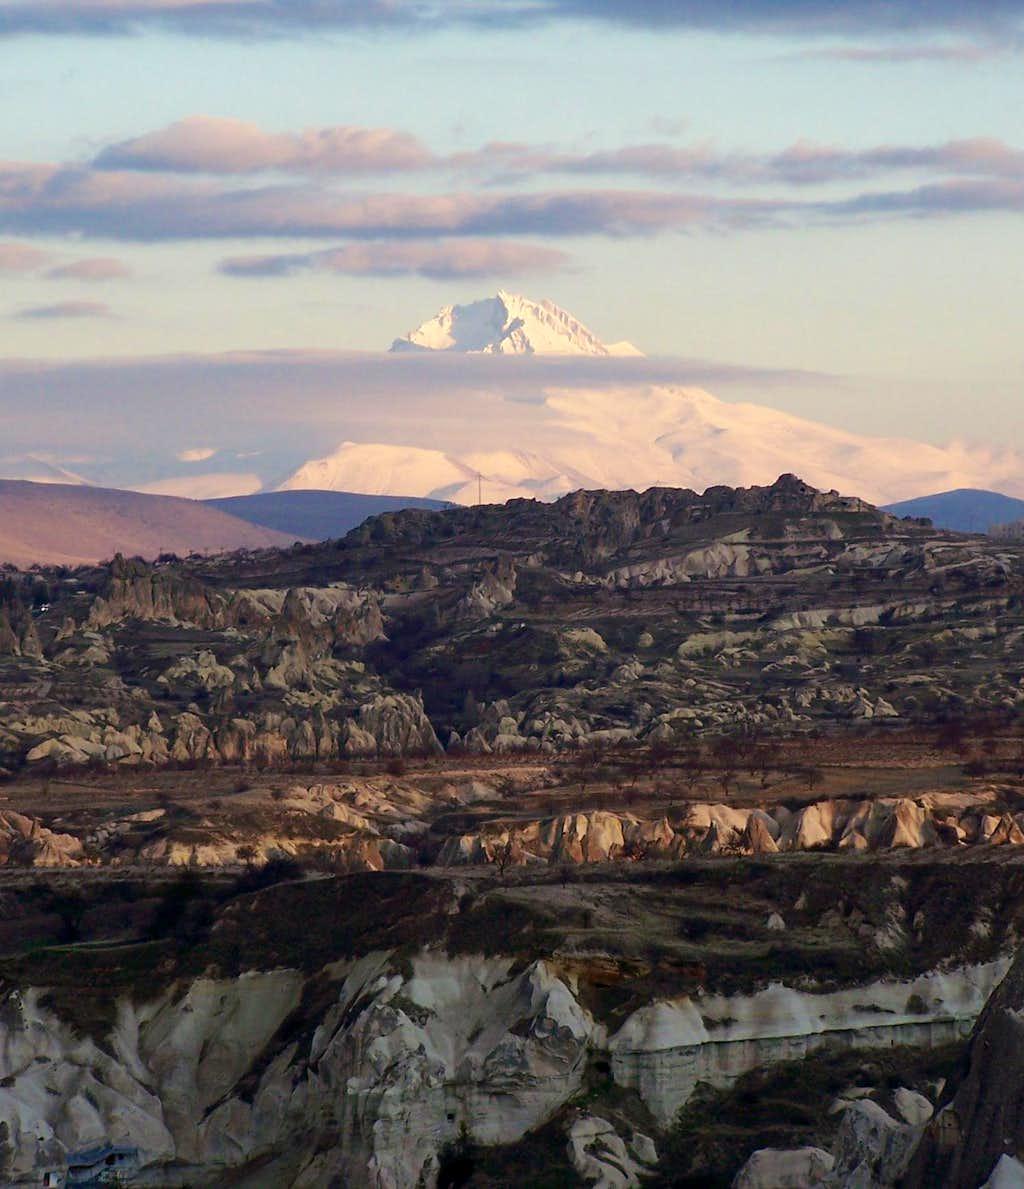 Erciyes Volcano from Cappadocia